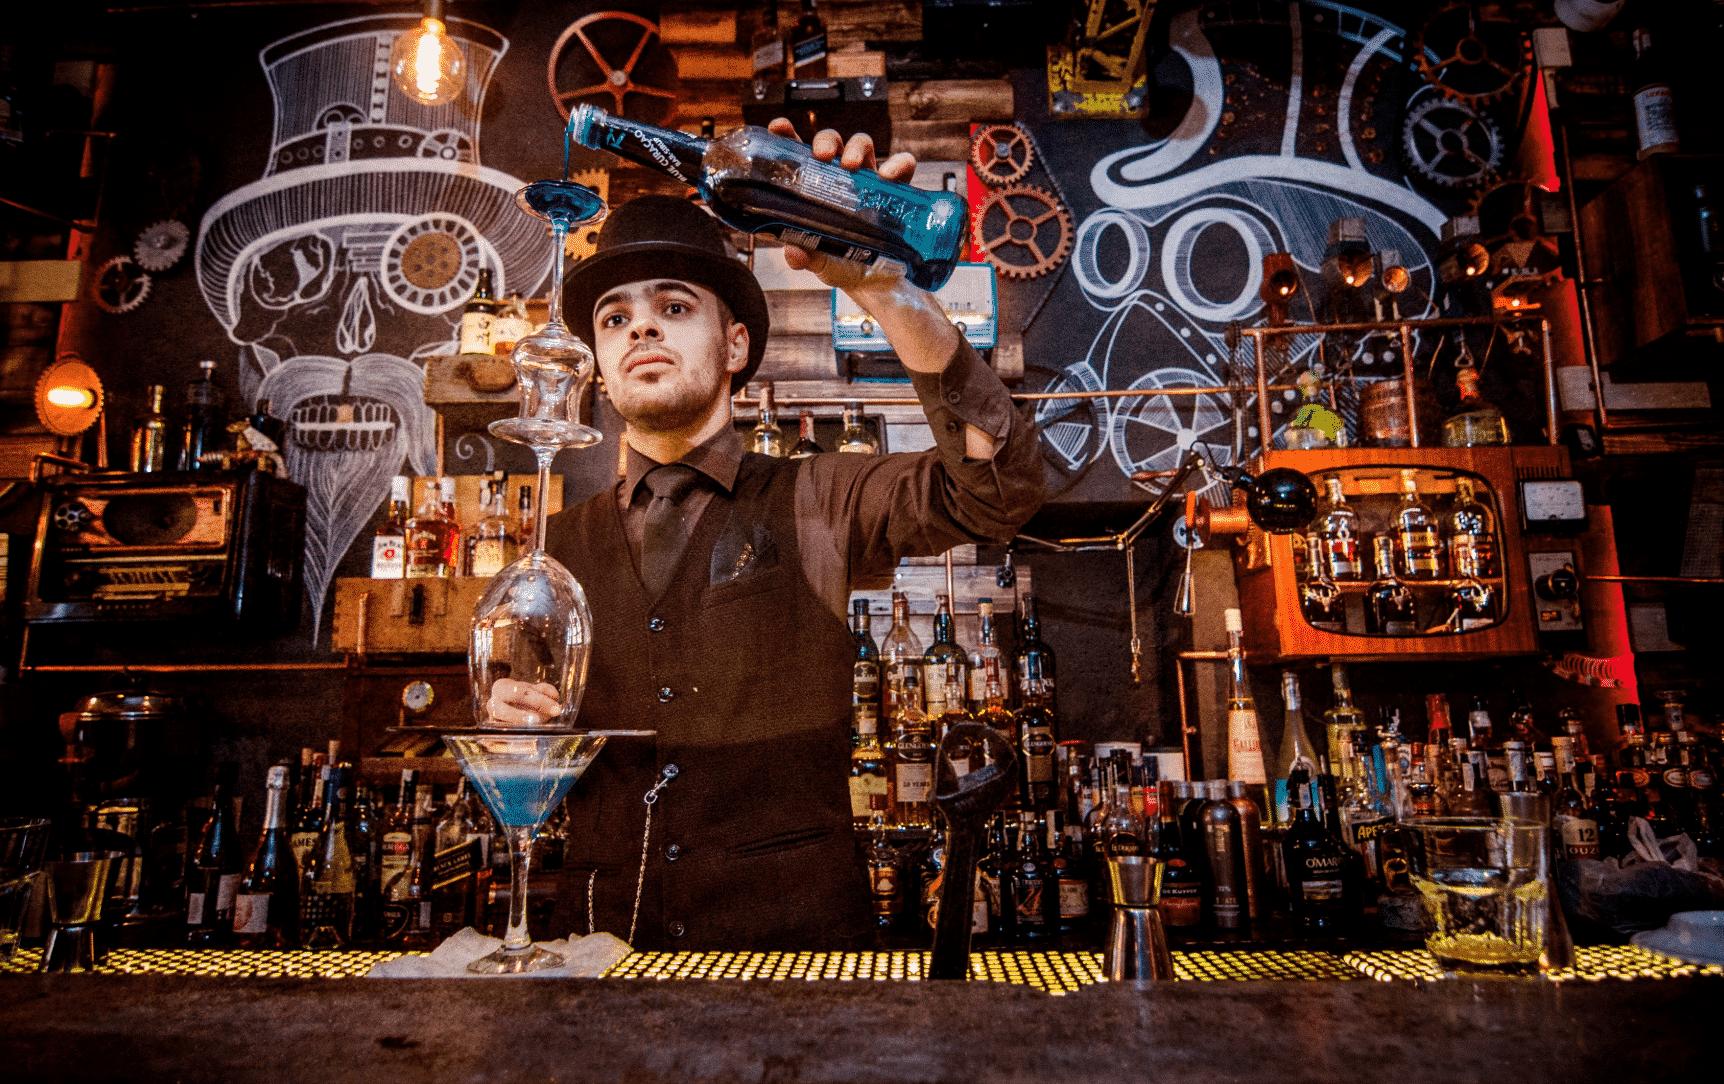 A magical bar in romania